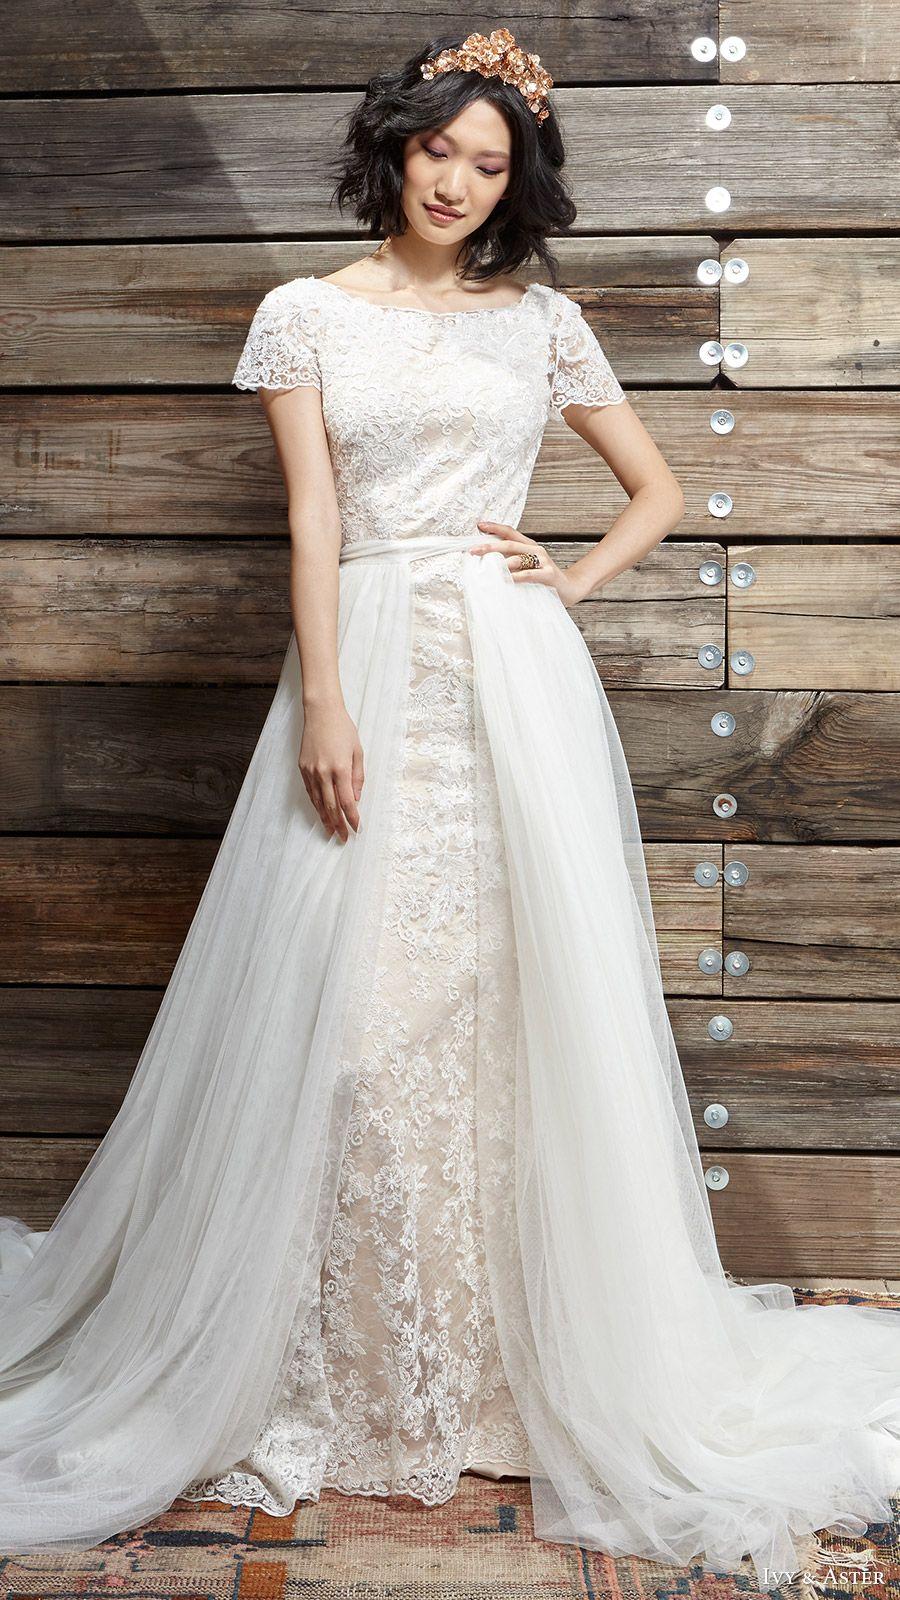 a4f598b21cf9 ivy aster bridal spring 2017 cap sleeves jewel neck lace wedding dress  (sylvia vera overskirt) mv scoop back